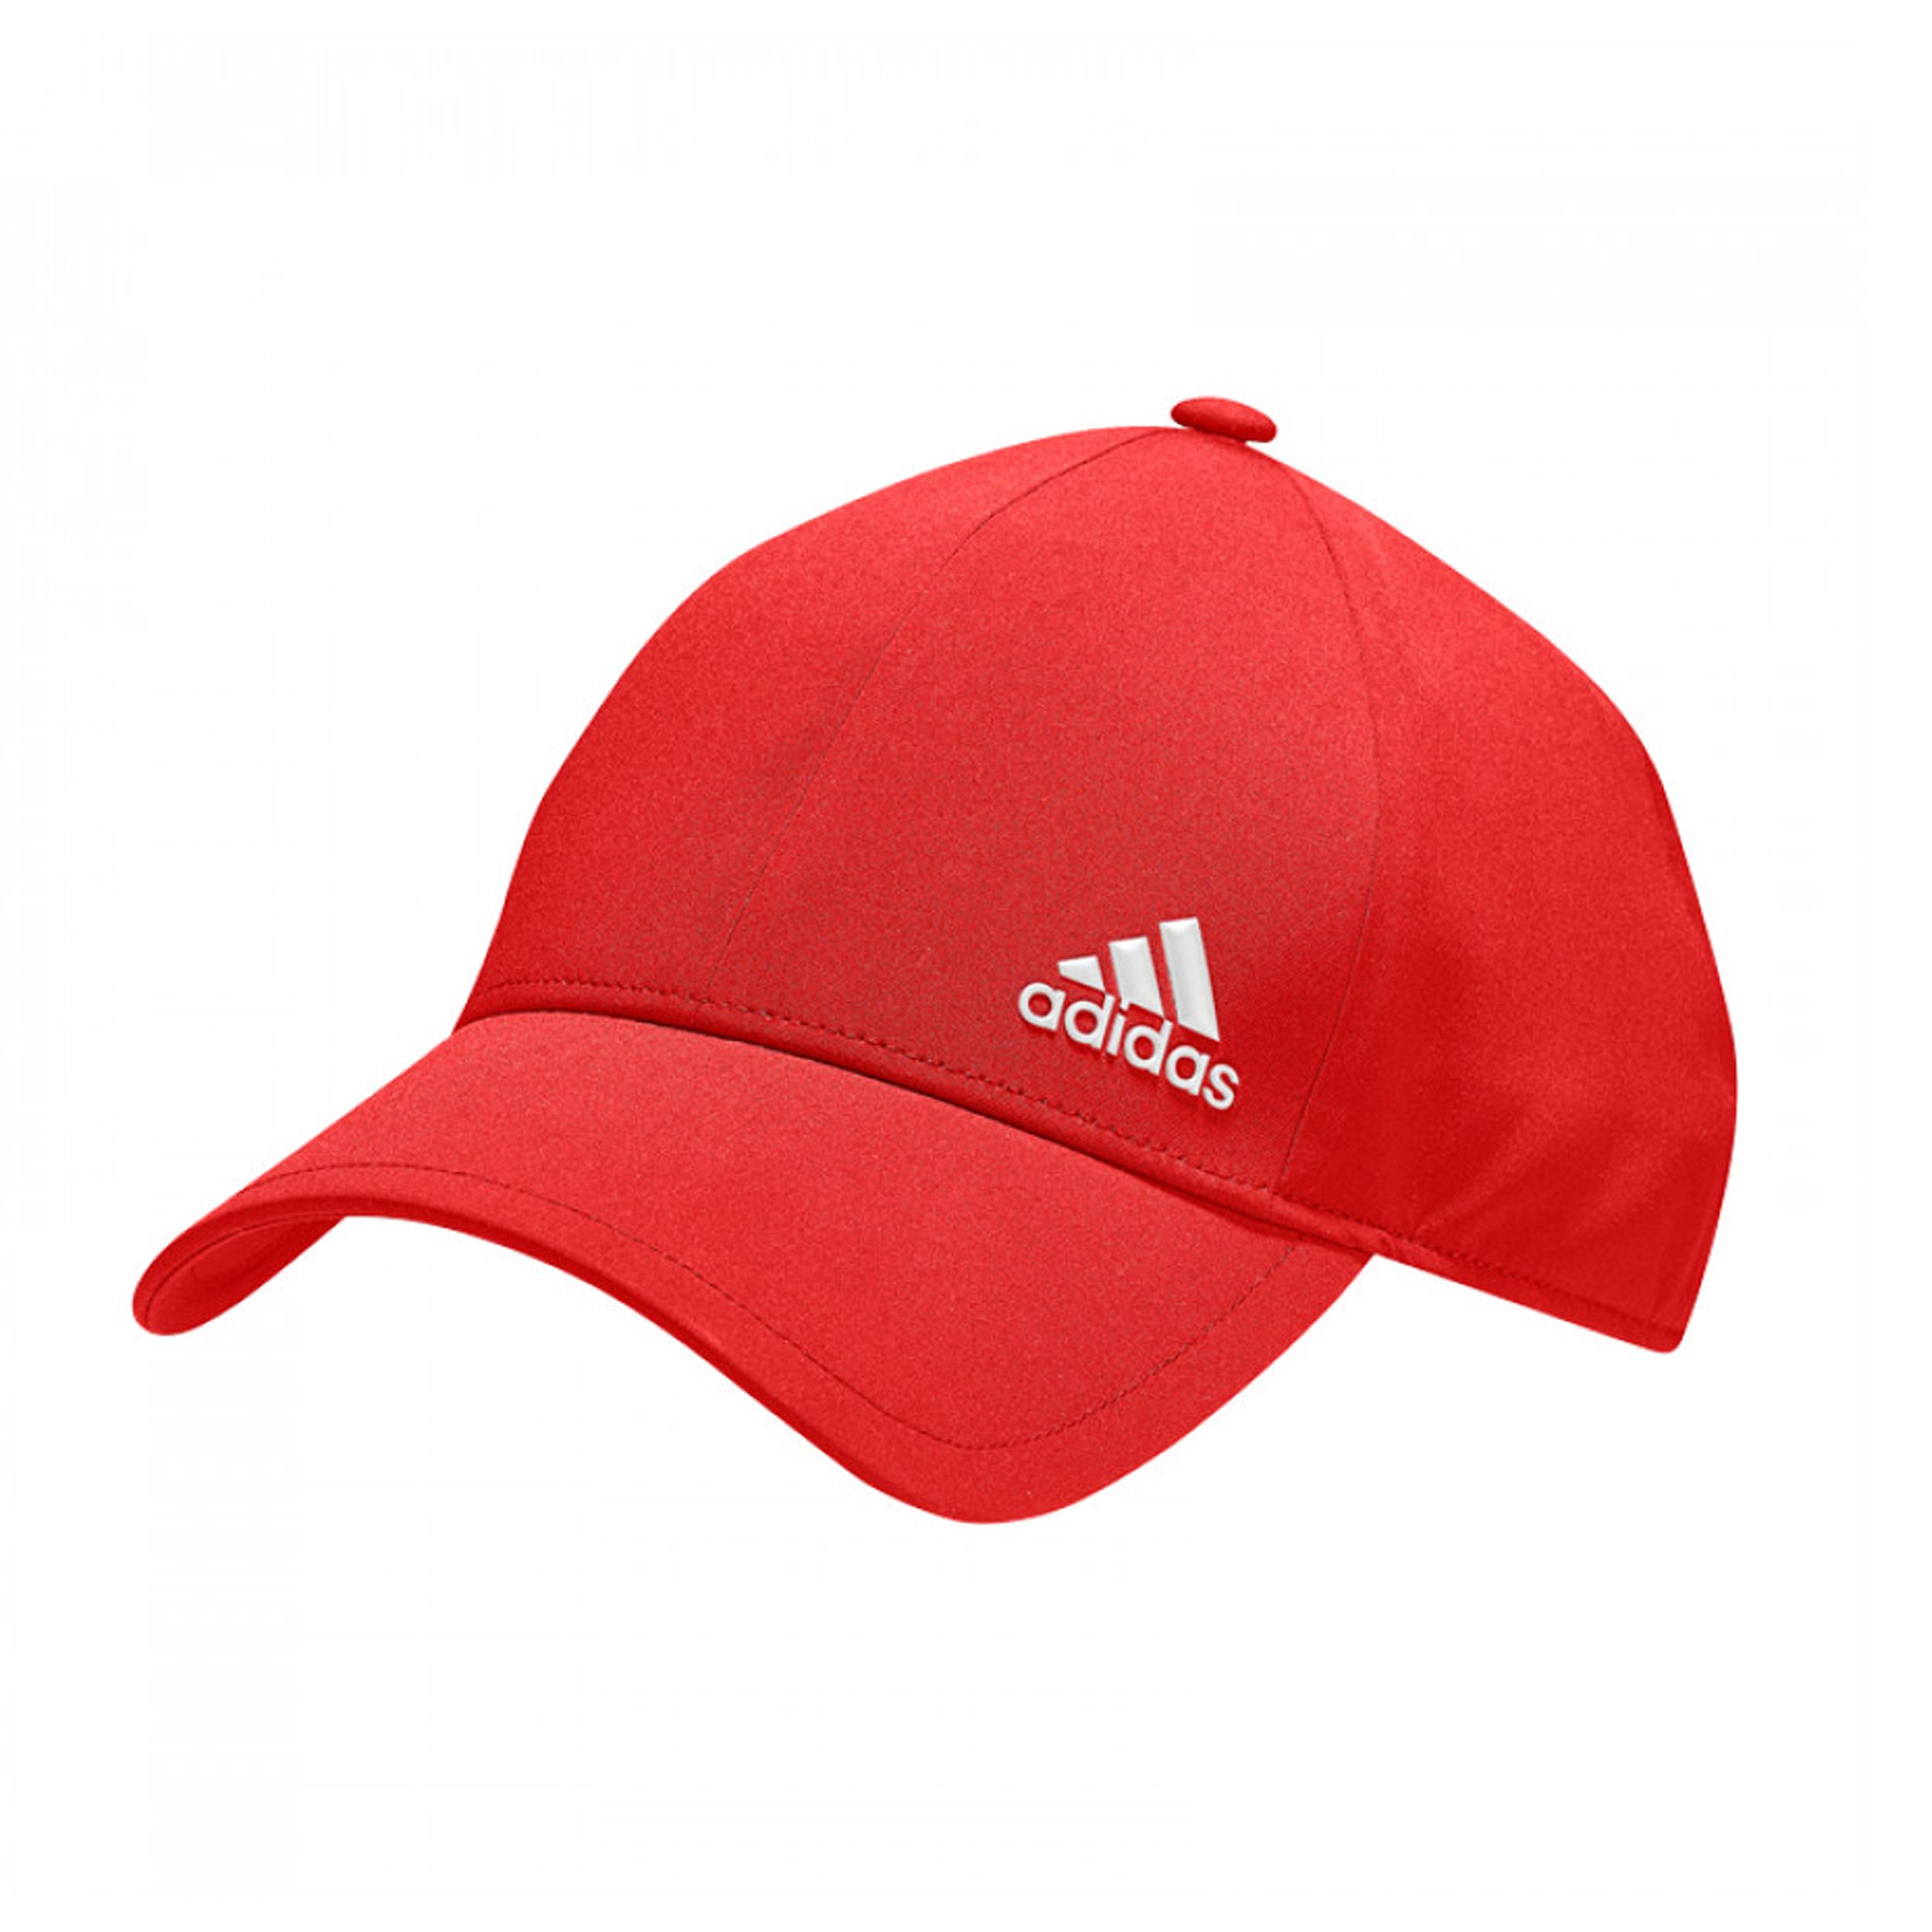 کلاه مردانه آدیداس مدل CG1789